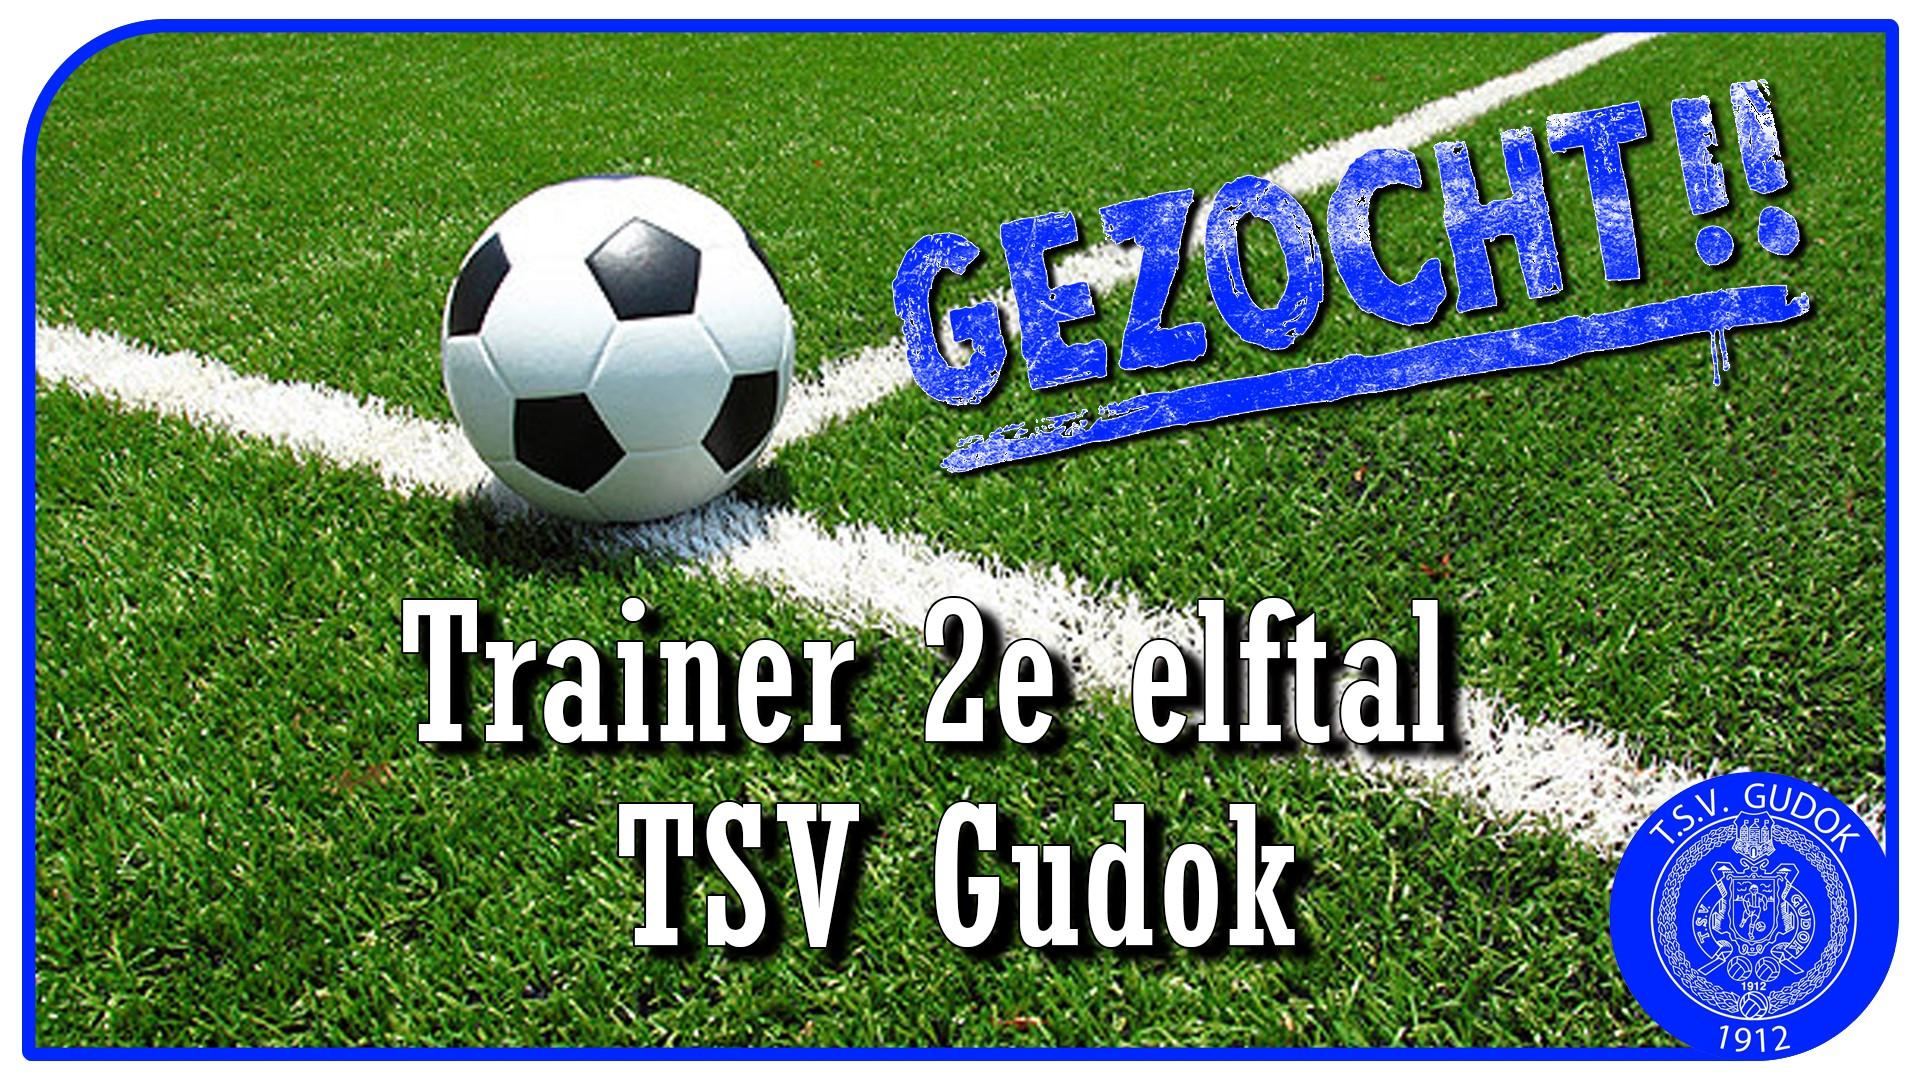 Vacature trainer 2e elftal TSV Gudok